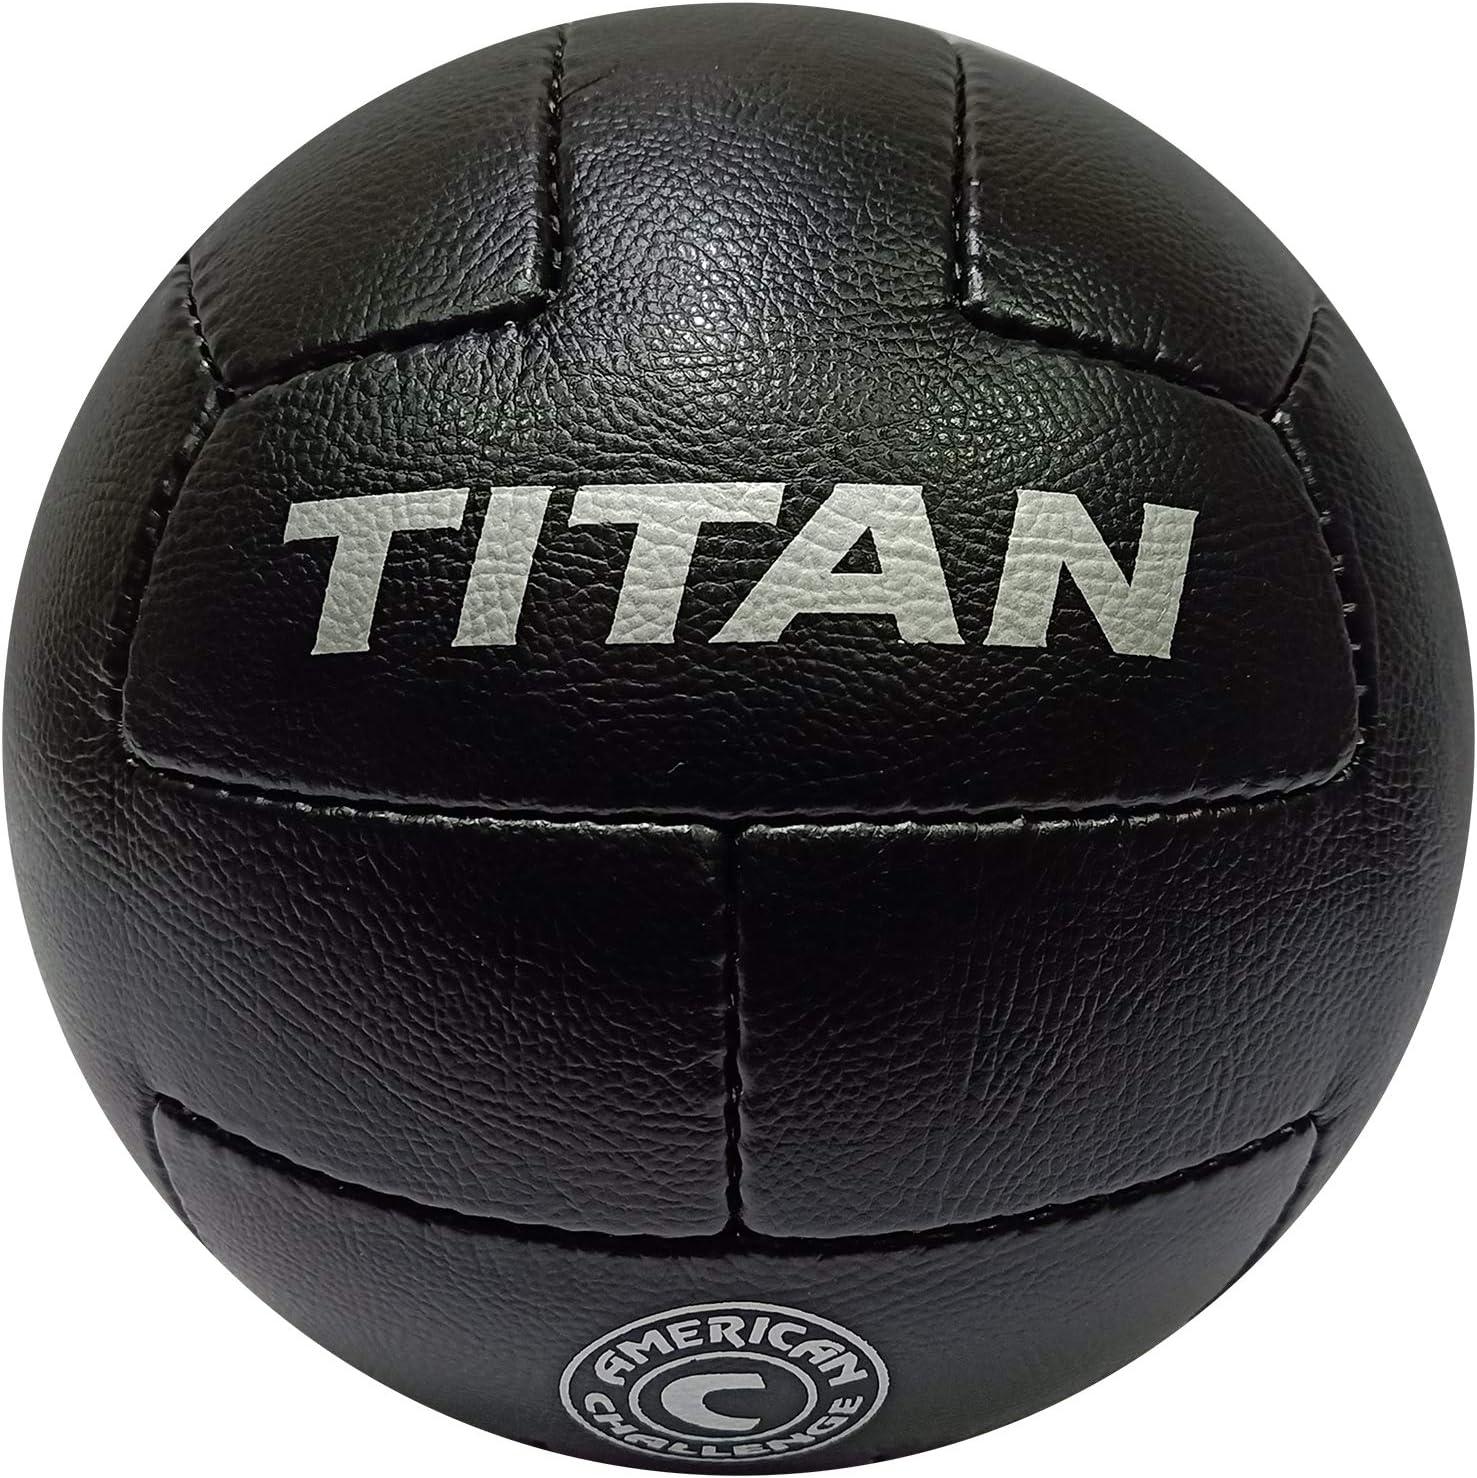 Sports  Outdoors  American Challenge Titan Soccer Ball